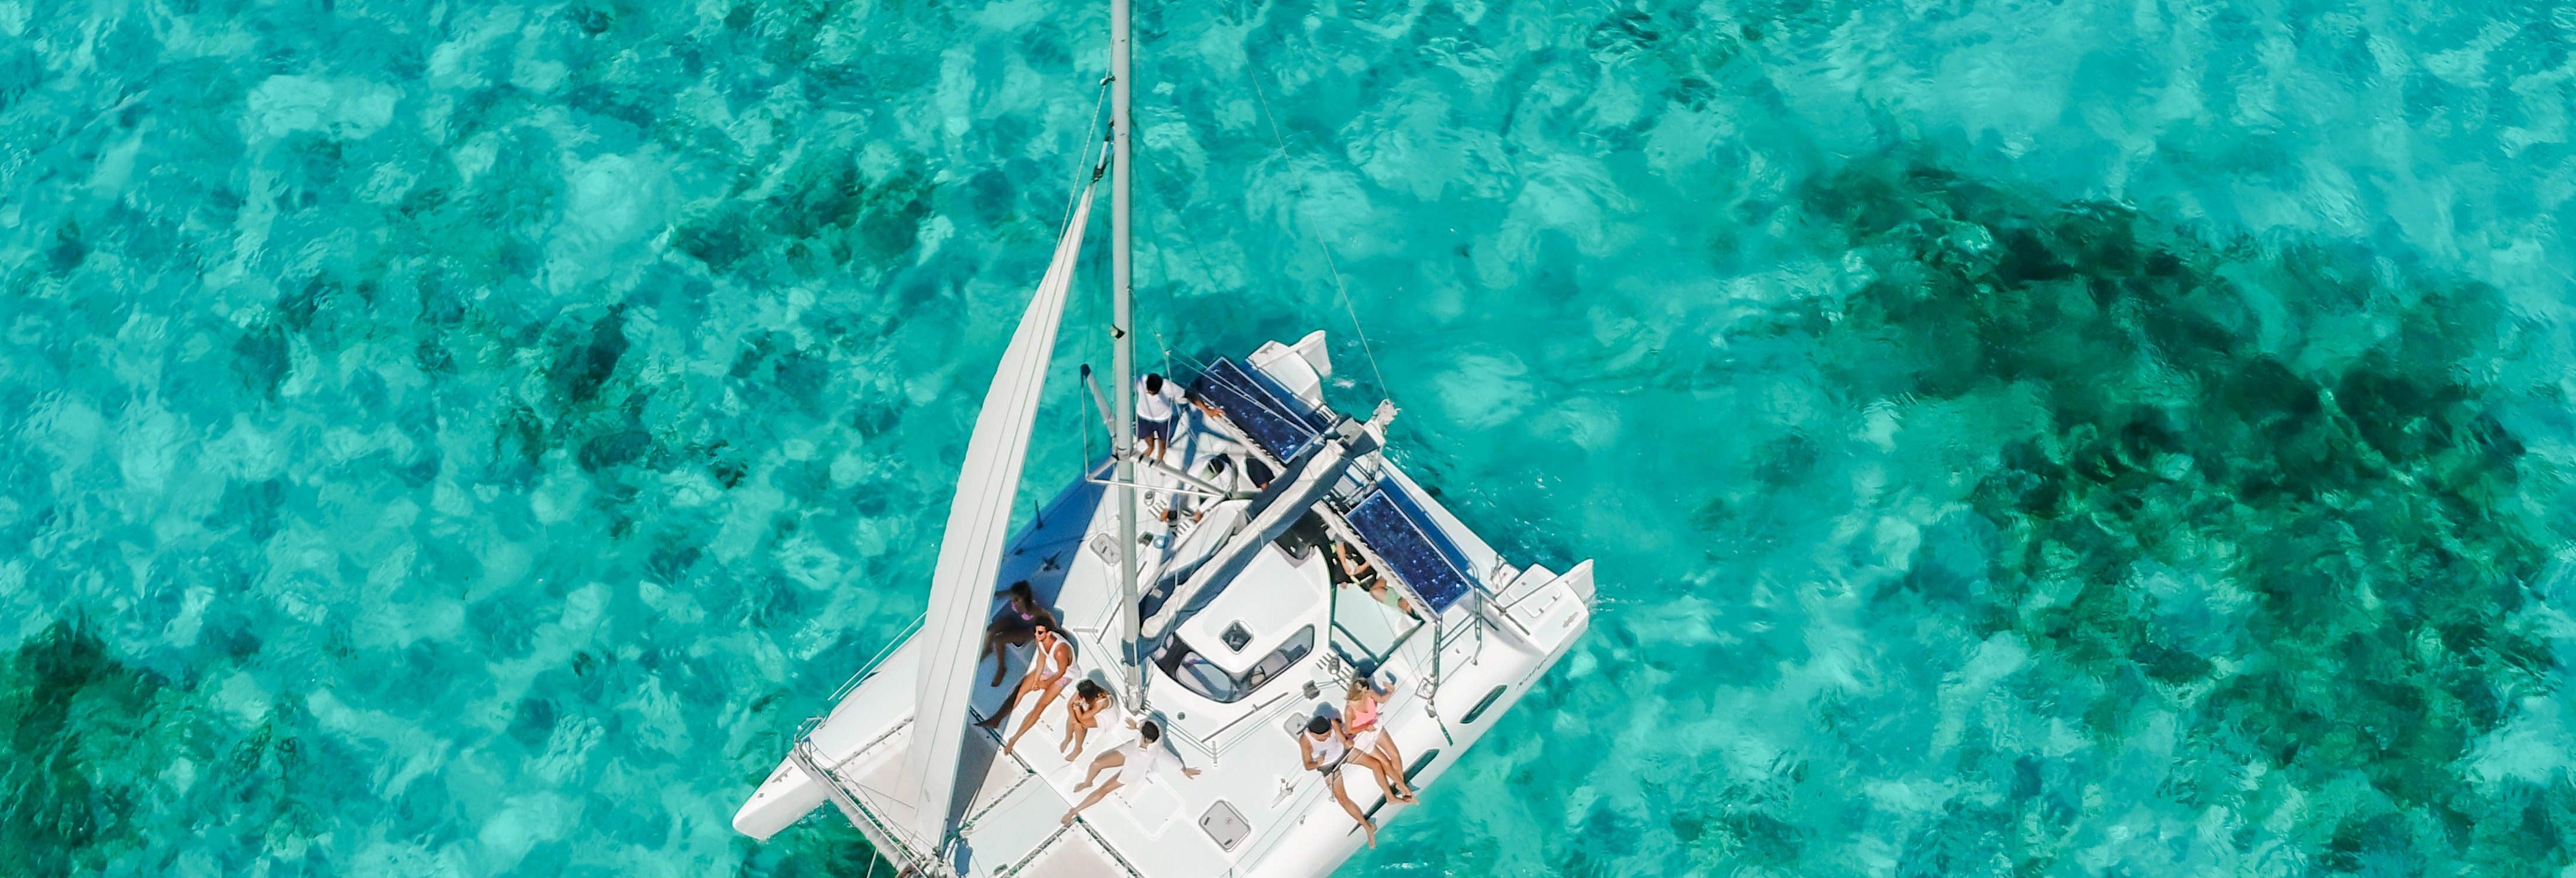 Excursión privada a Isla Mujeres en barco